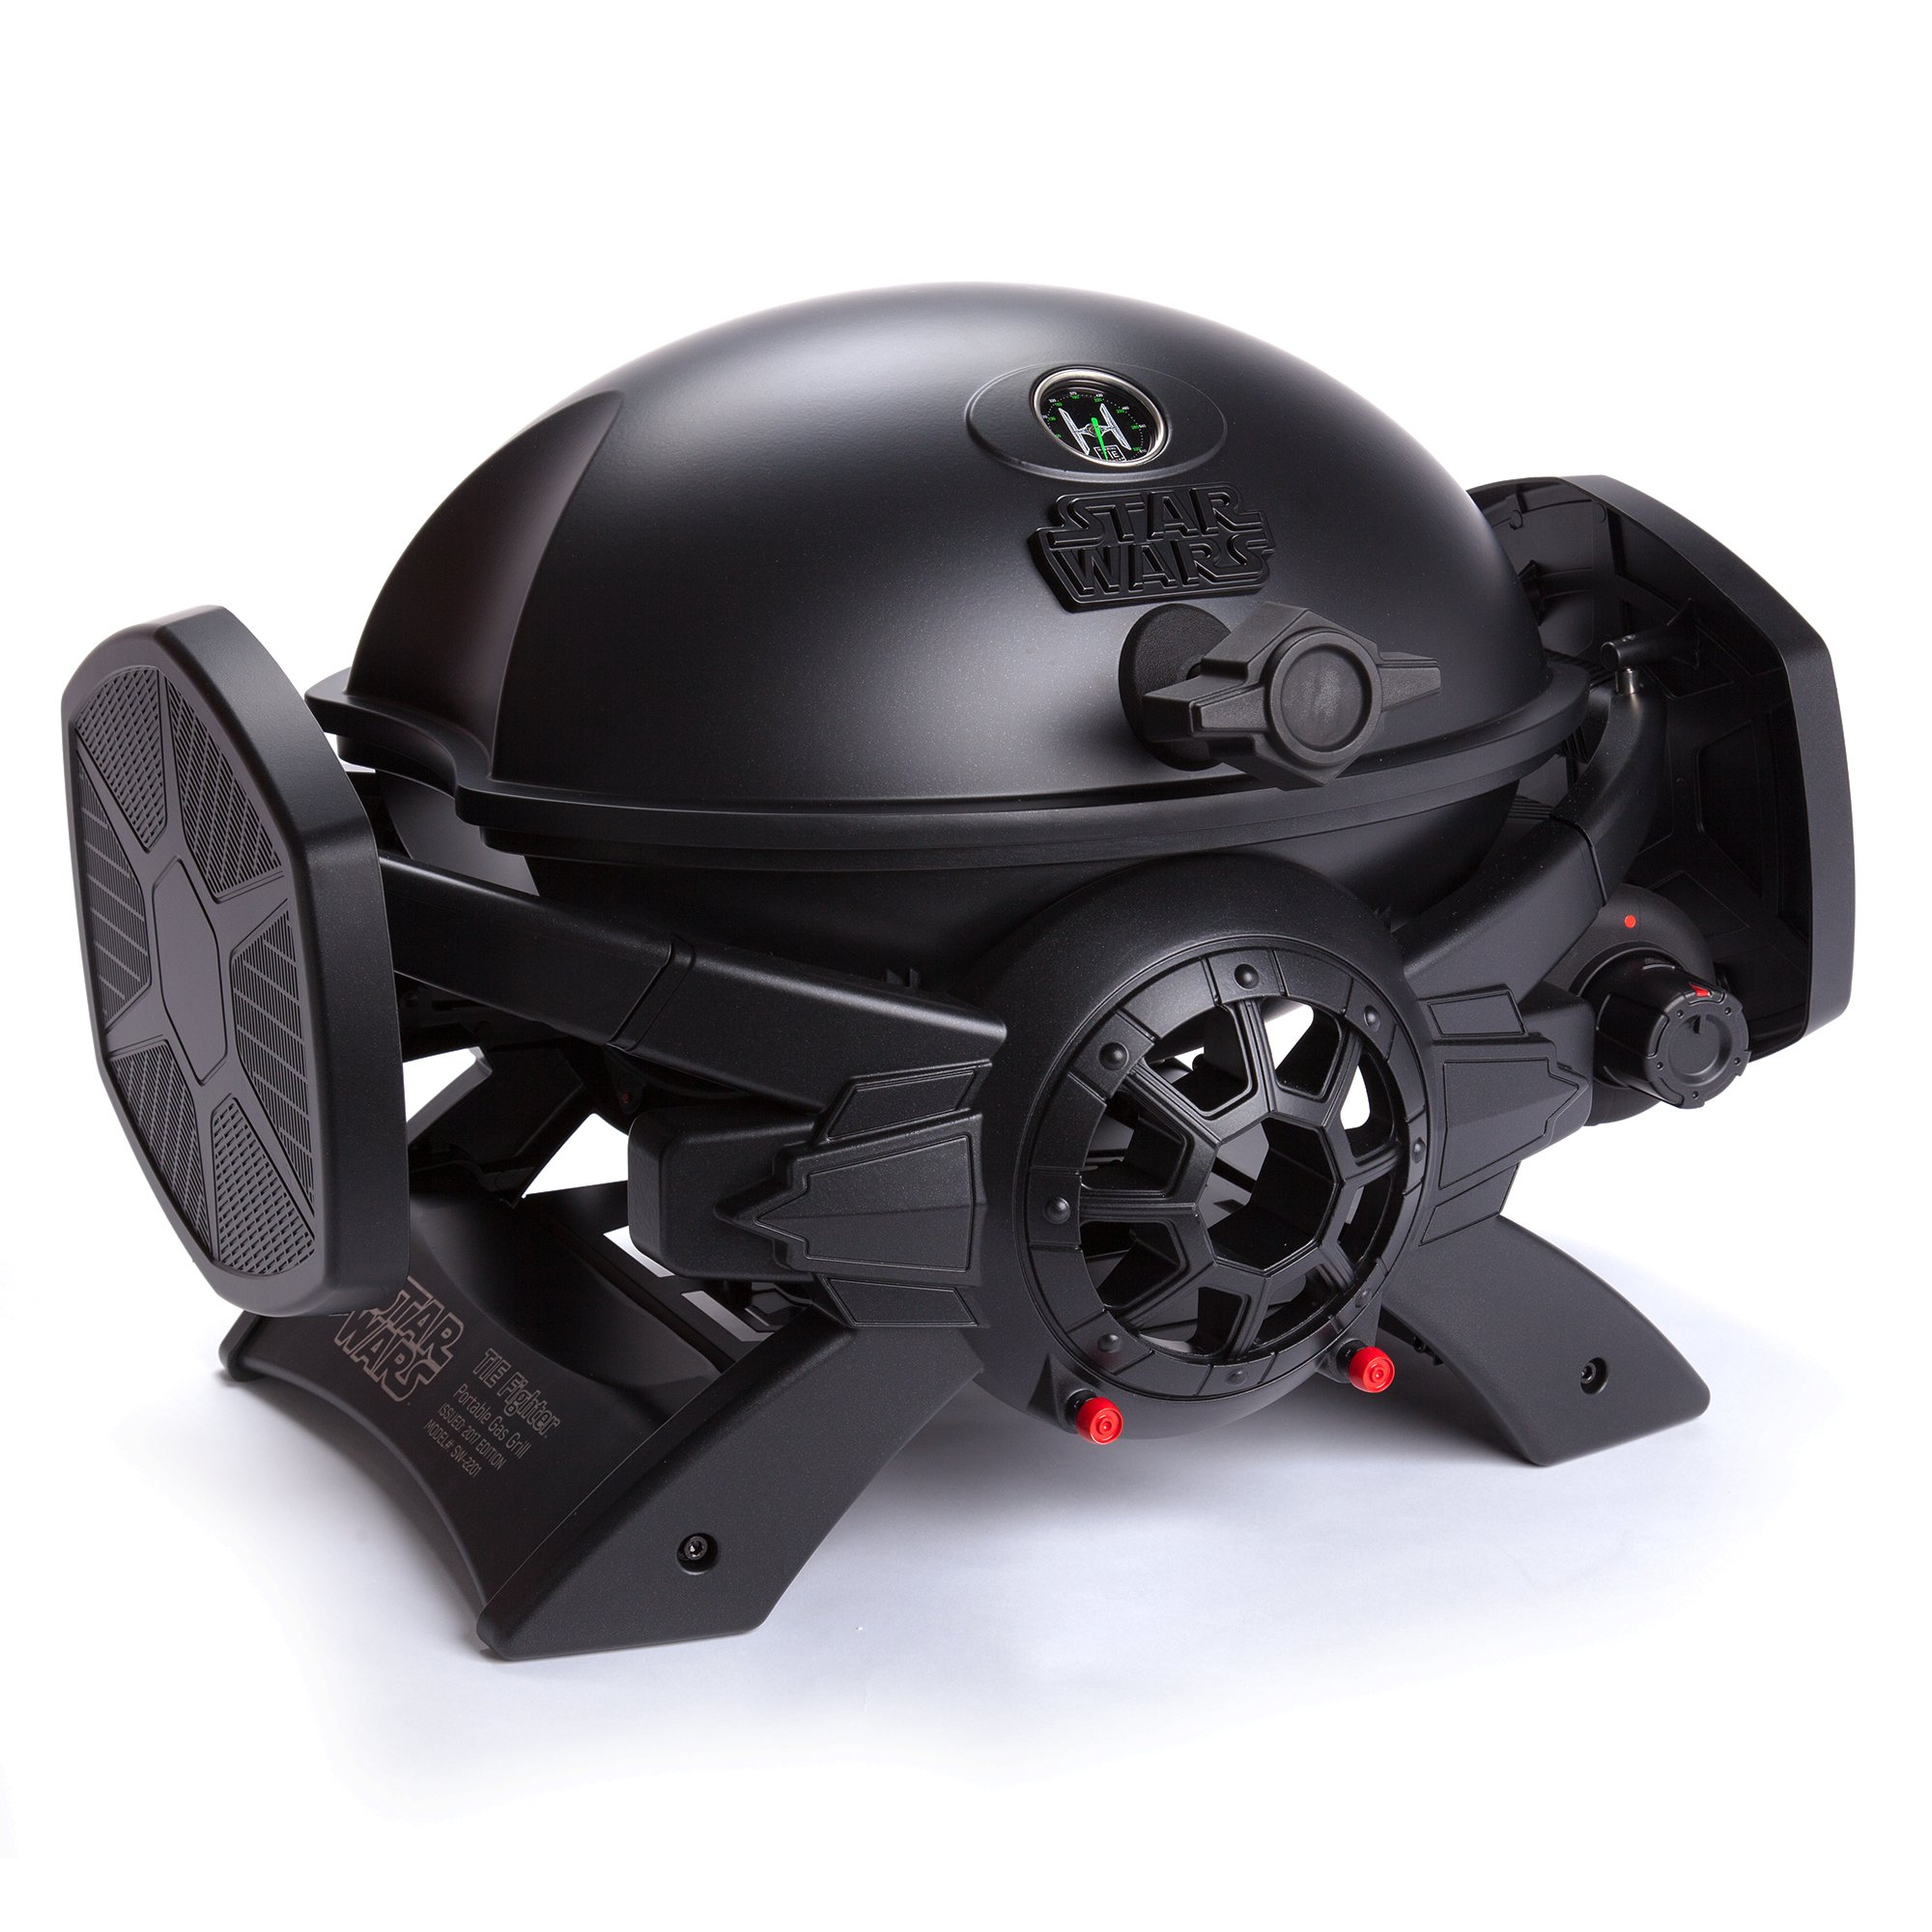 Broil Chef Star Wars TIE Fighter Gas Grill, Black, 37'' x 17.75'' x 15.75''